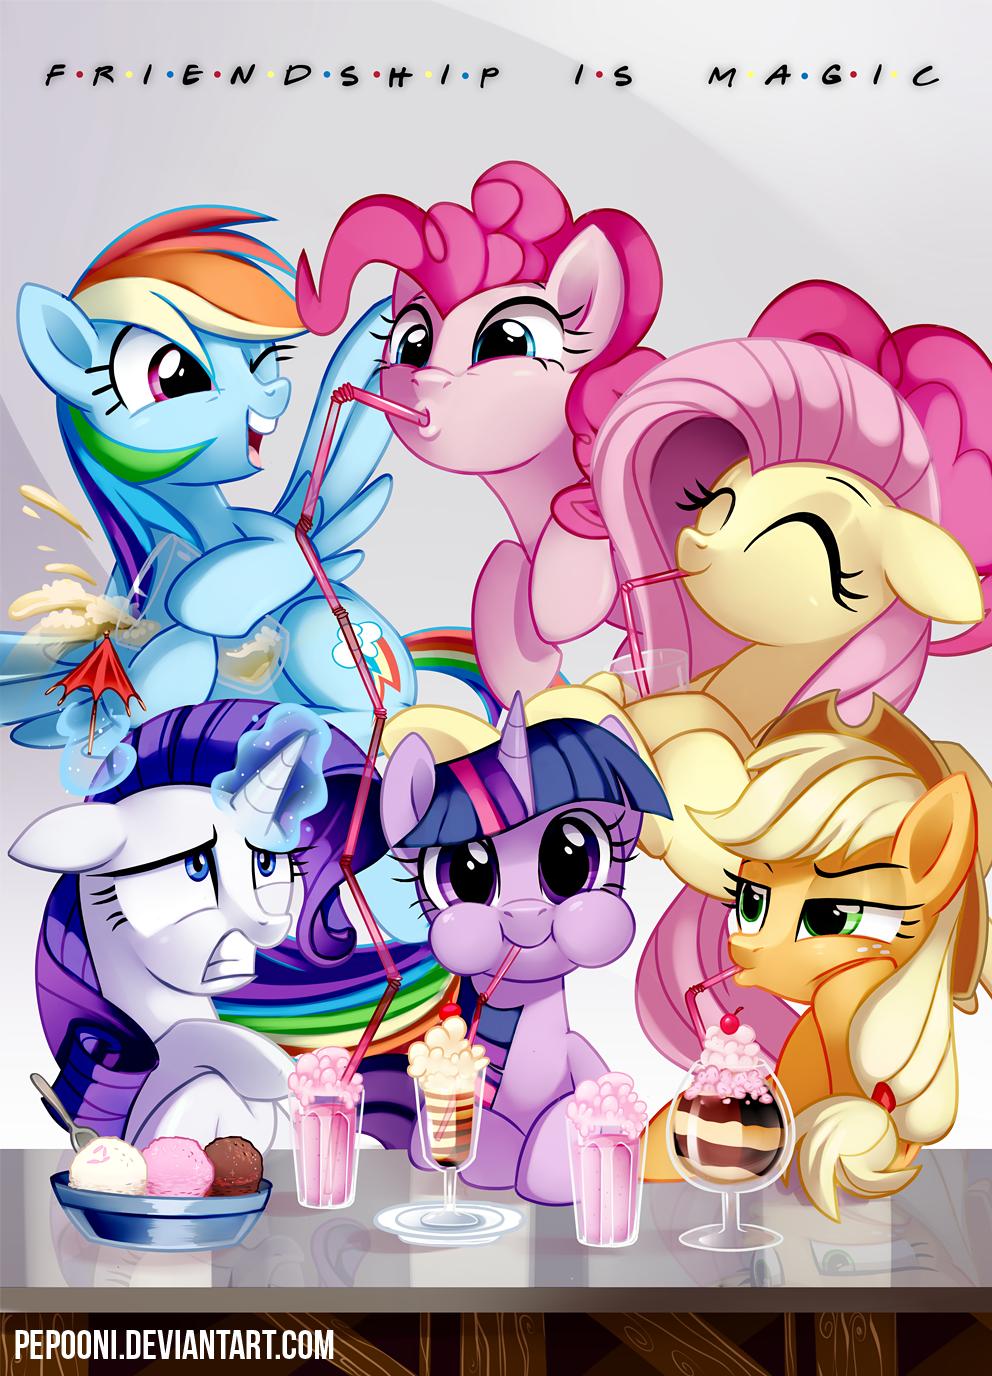 Friendship is magic - Bronycon 2015 by pepooni on DeviantArt